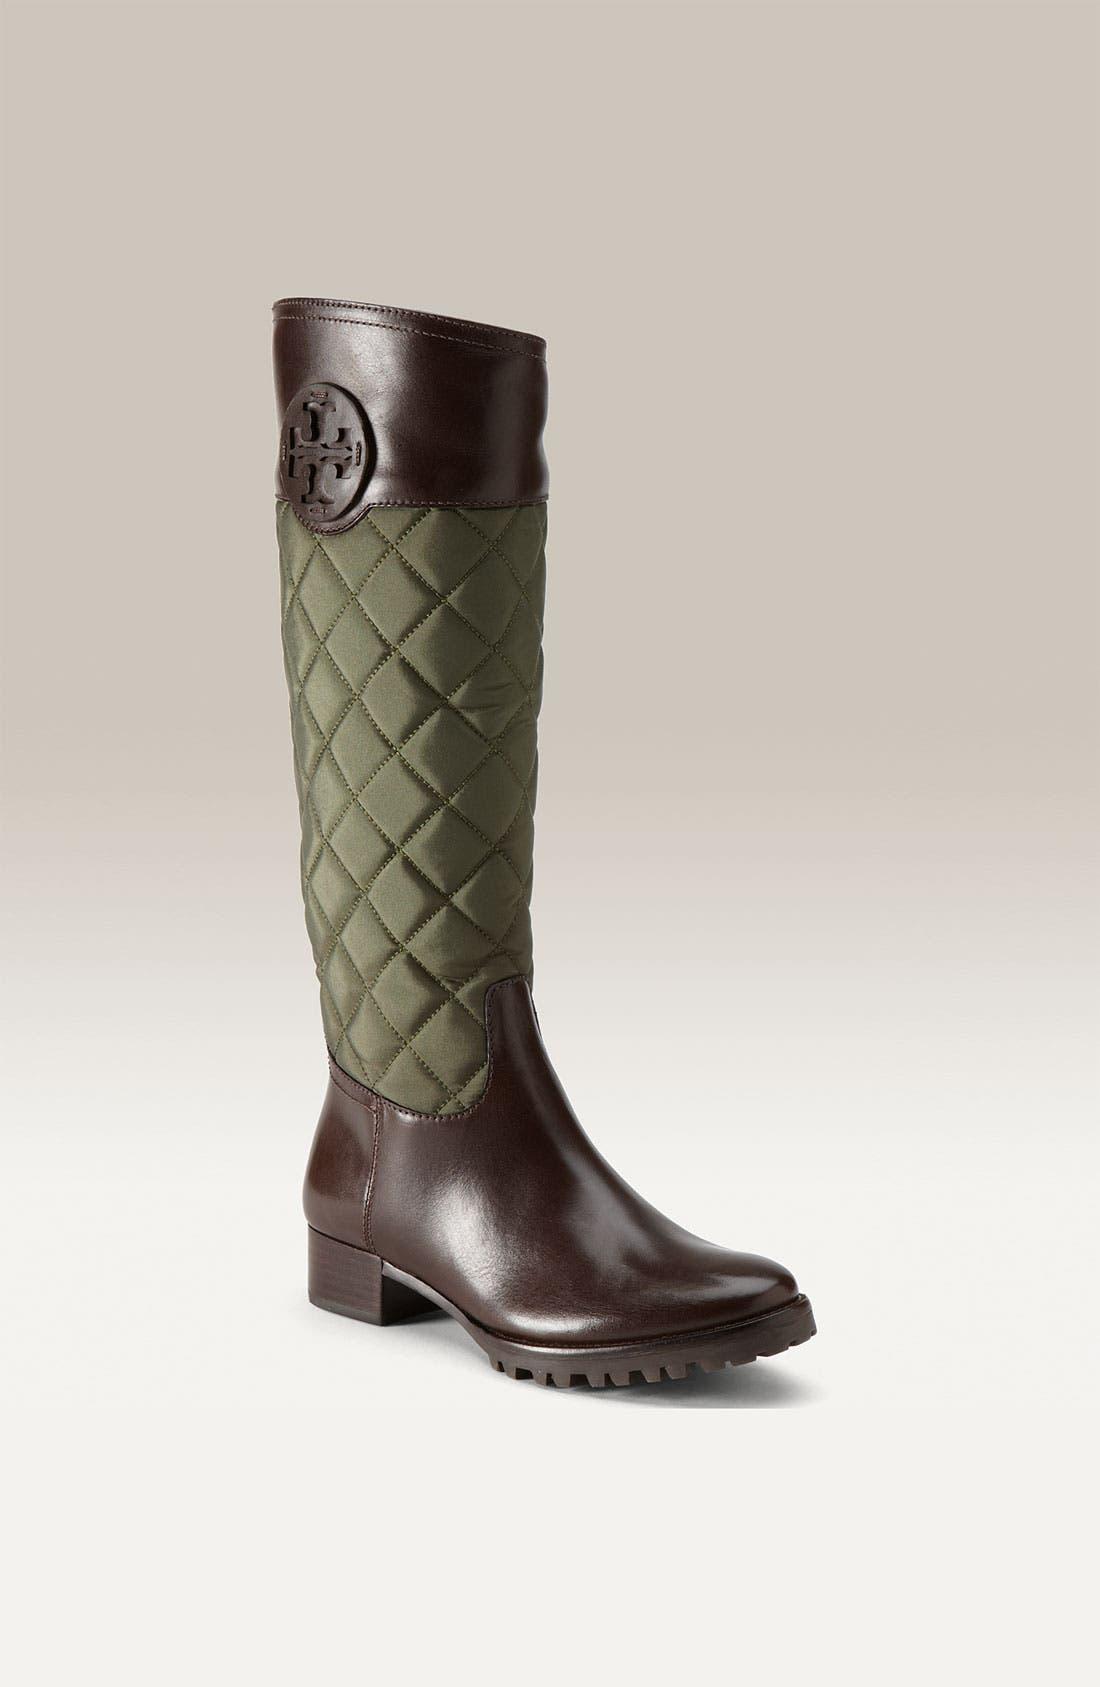 Alternate Image 1 Selected - Tory Burch 'Rowan' Boot